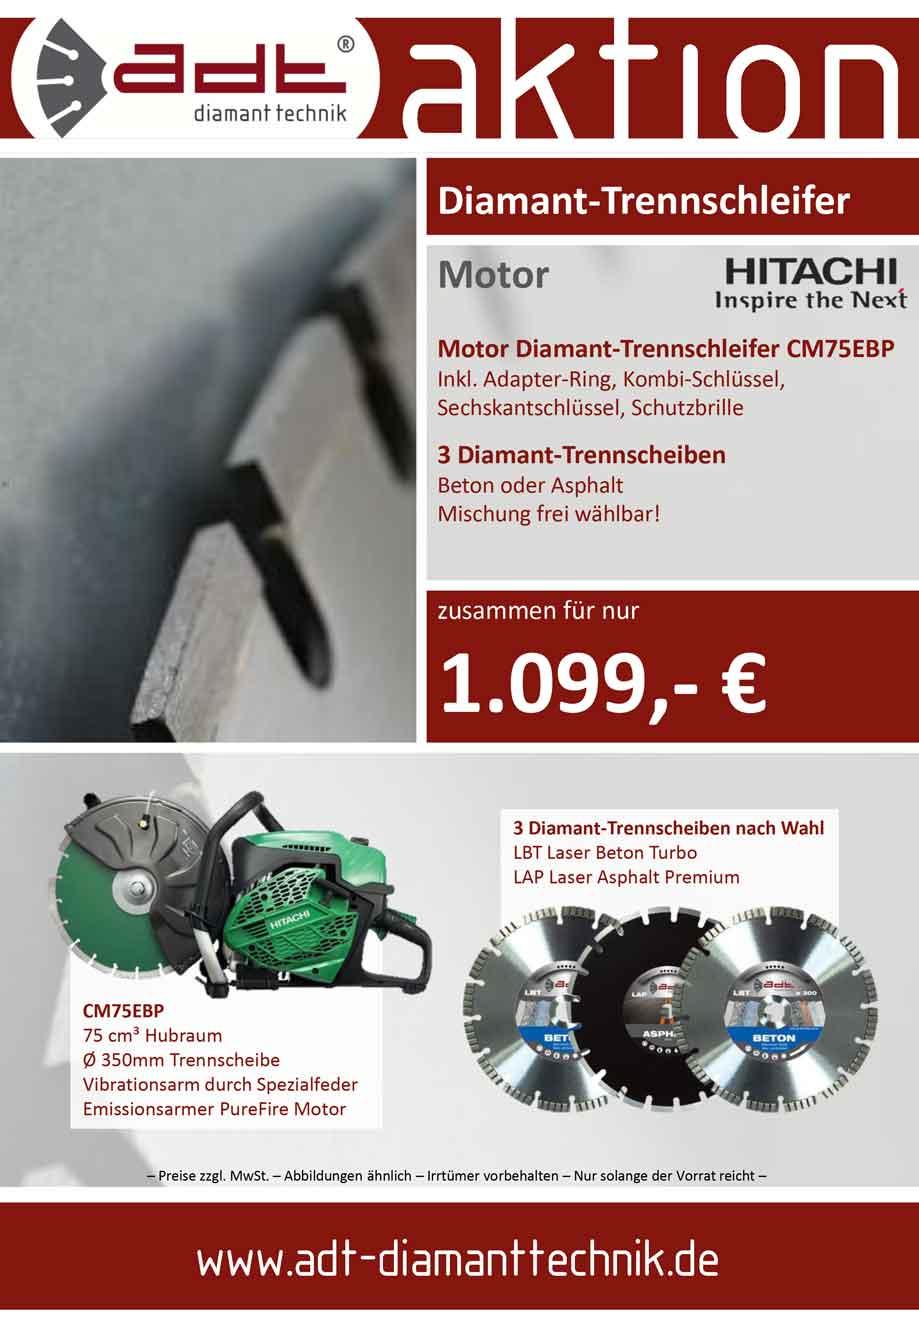 Hitachi Diamant-Trennschleifer CM75EBP Angebot